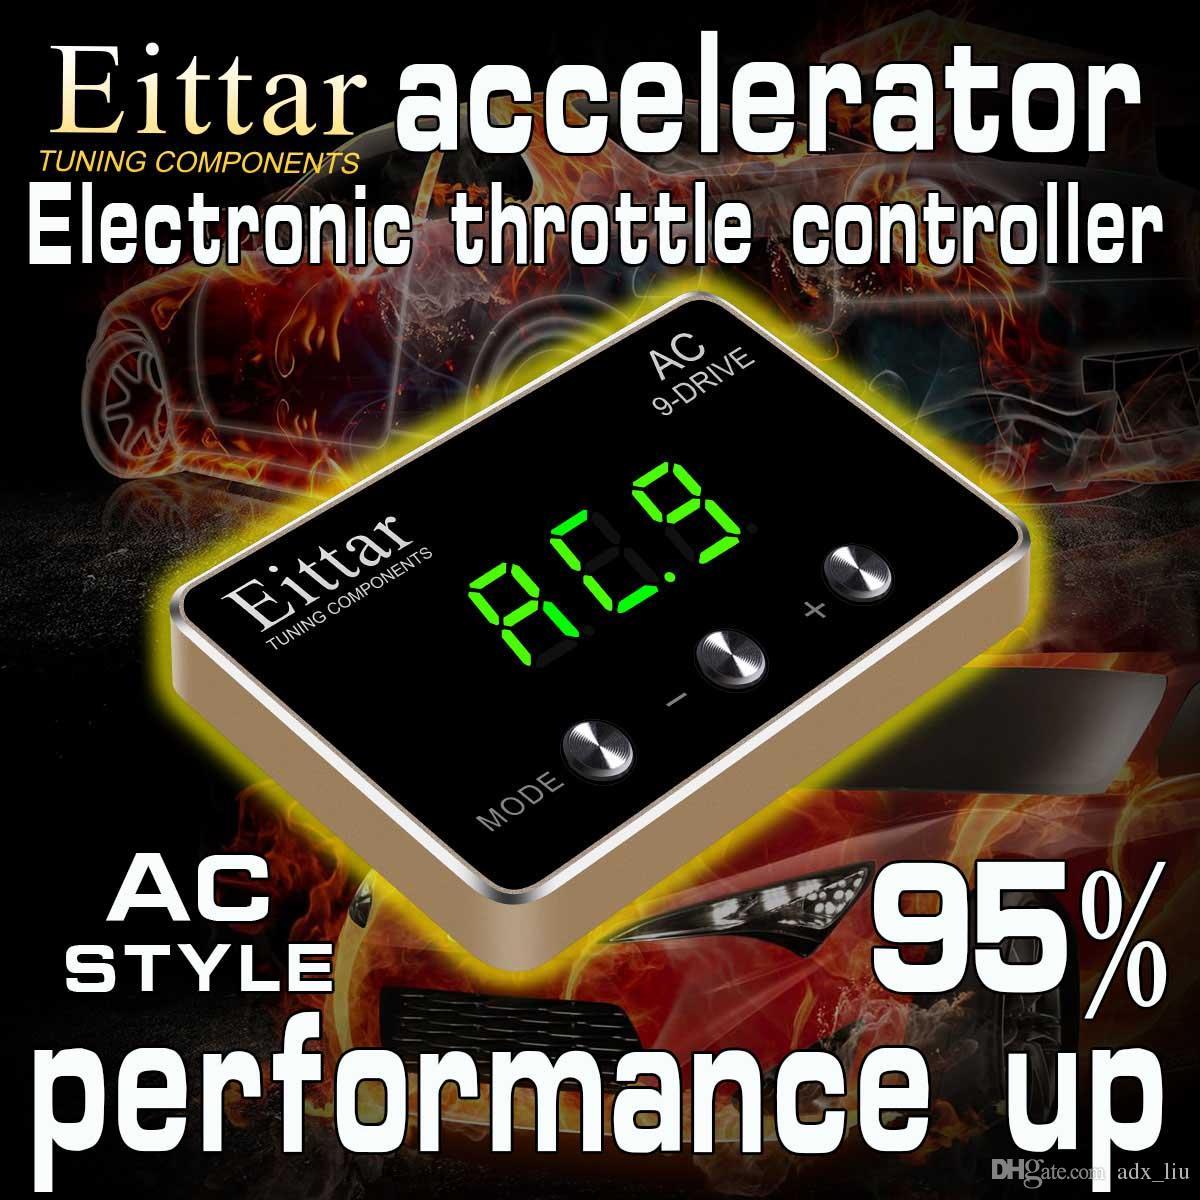 Eittar Electronic Throttle Controller Accelerator For HONDA ACCORD CW1 CW2  CU1 CU2 2008.12+ Compressor Turbocharger Electric Turbocharger From  Adx_liu, ...